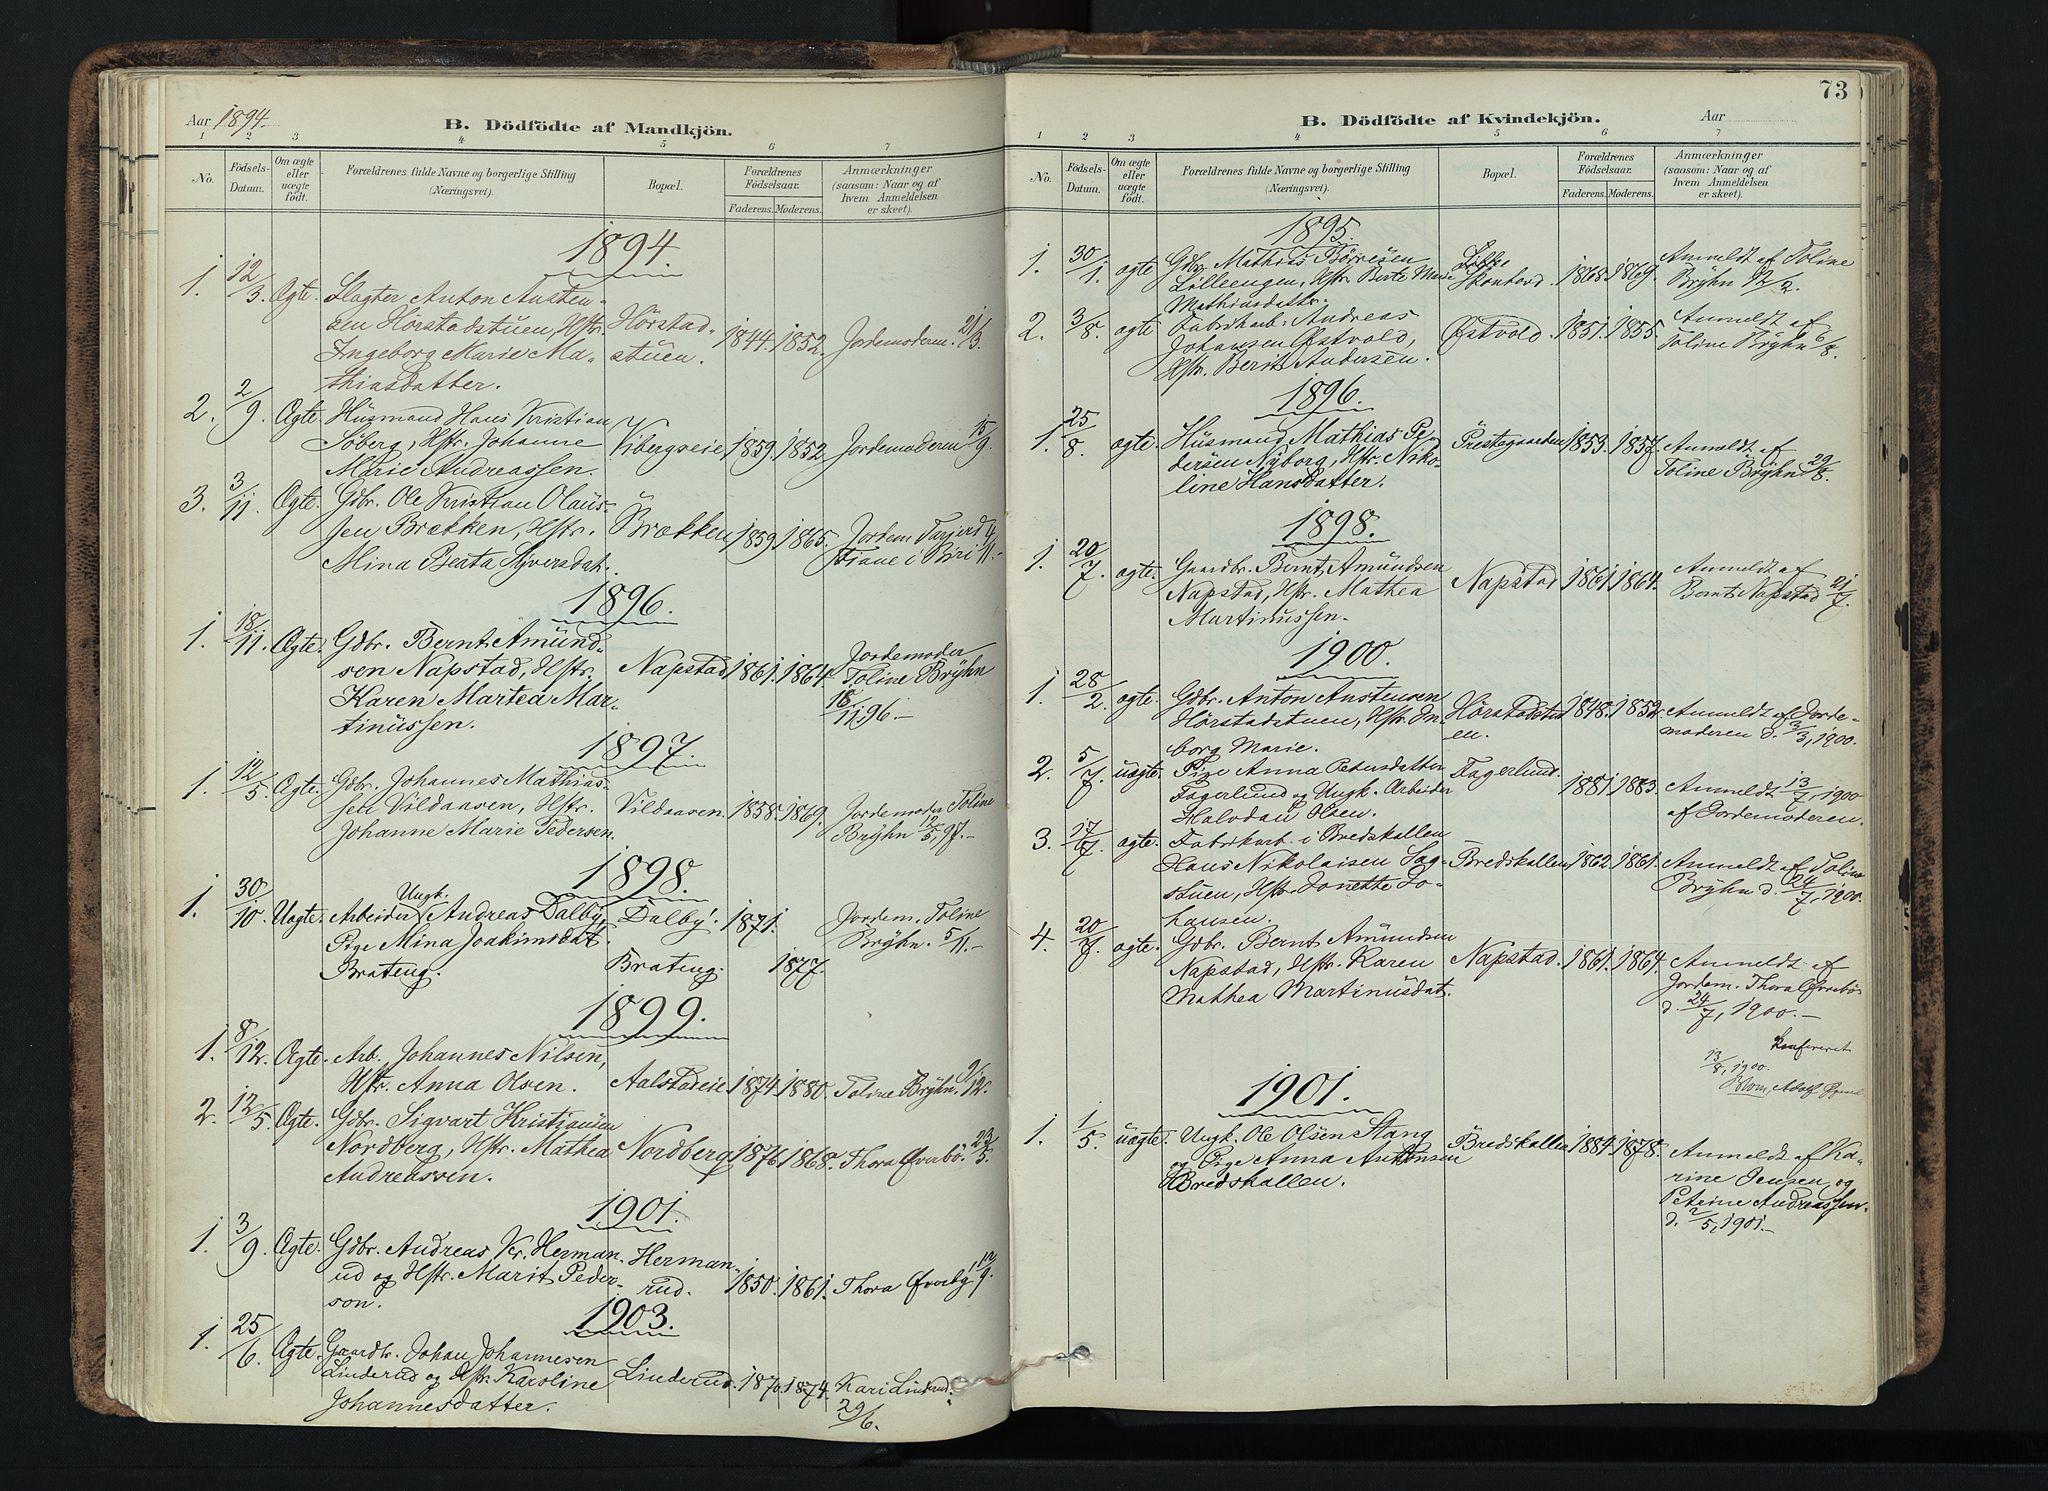 SAH, Vardal prestekontor, H/Ha/Haa/L0019: Ministerialbok nr. 19, 1893-1907, s. 73